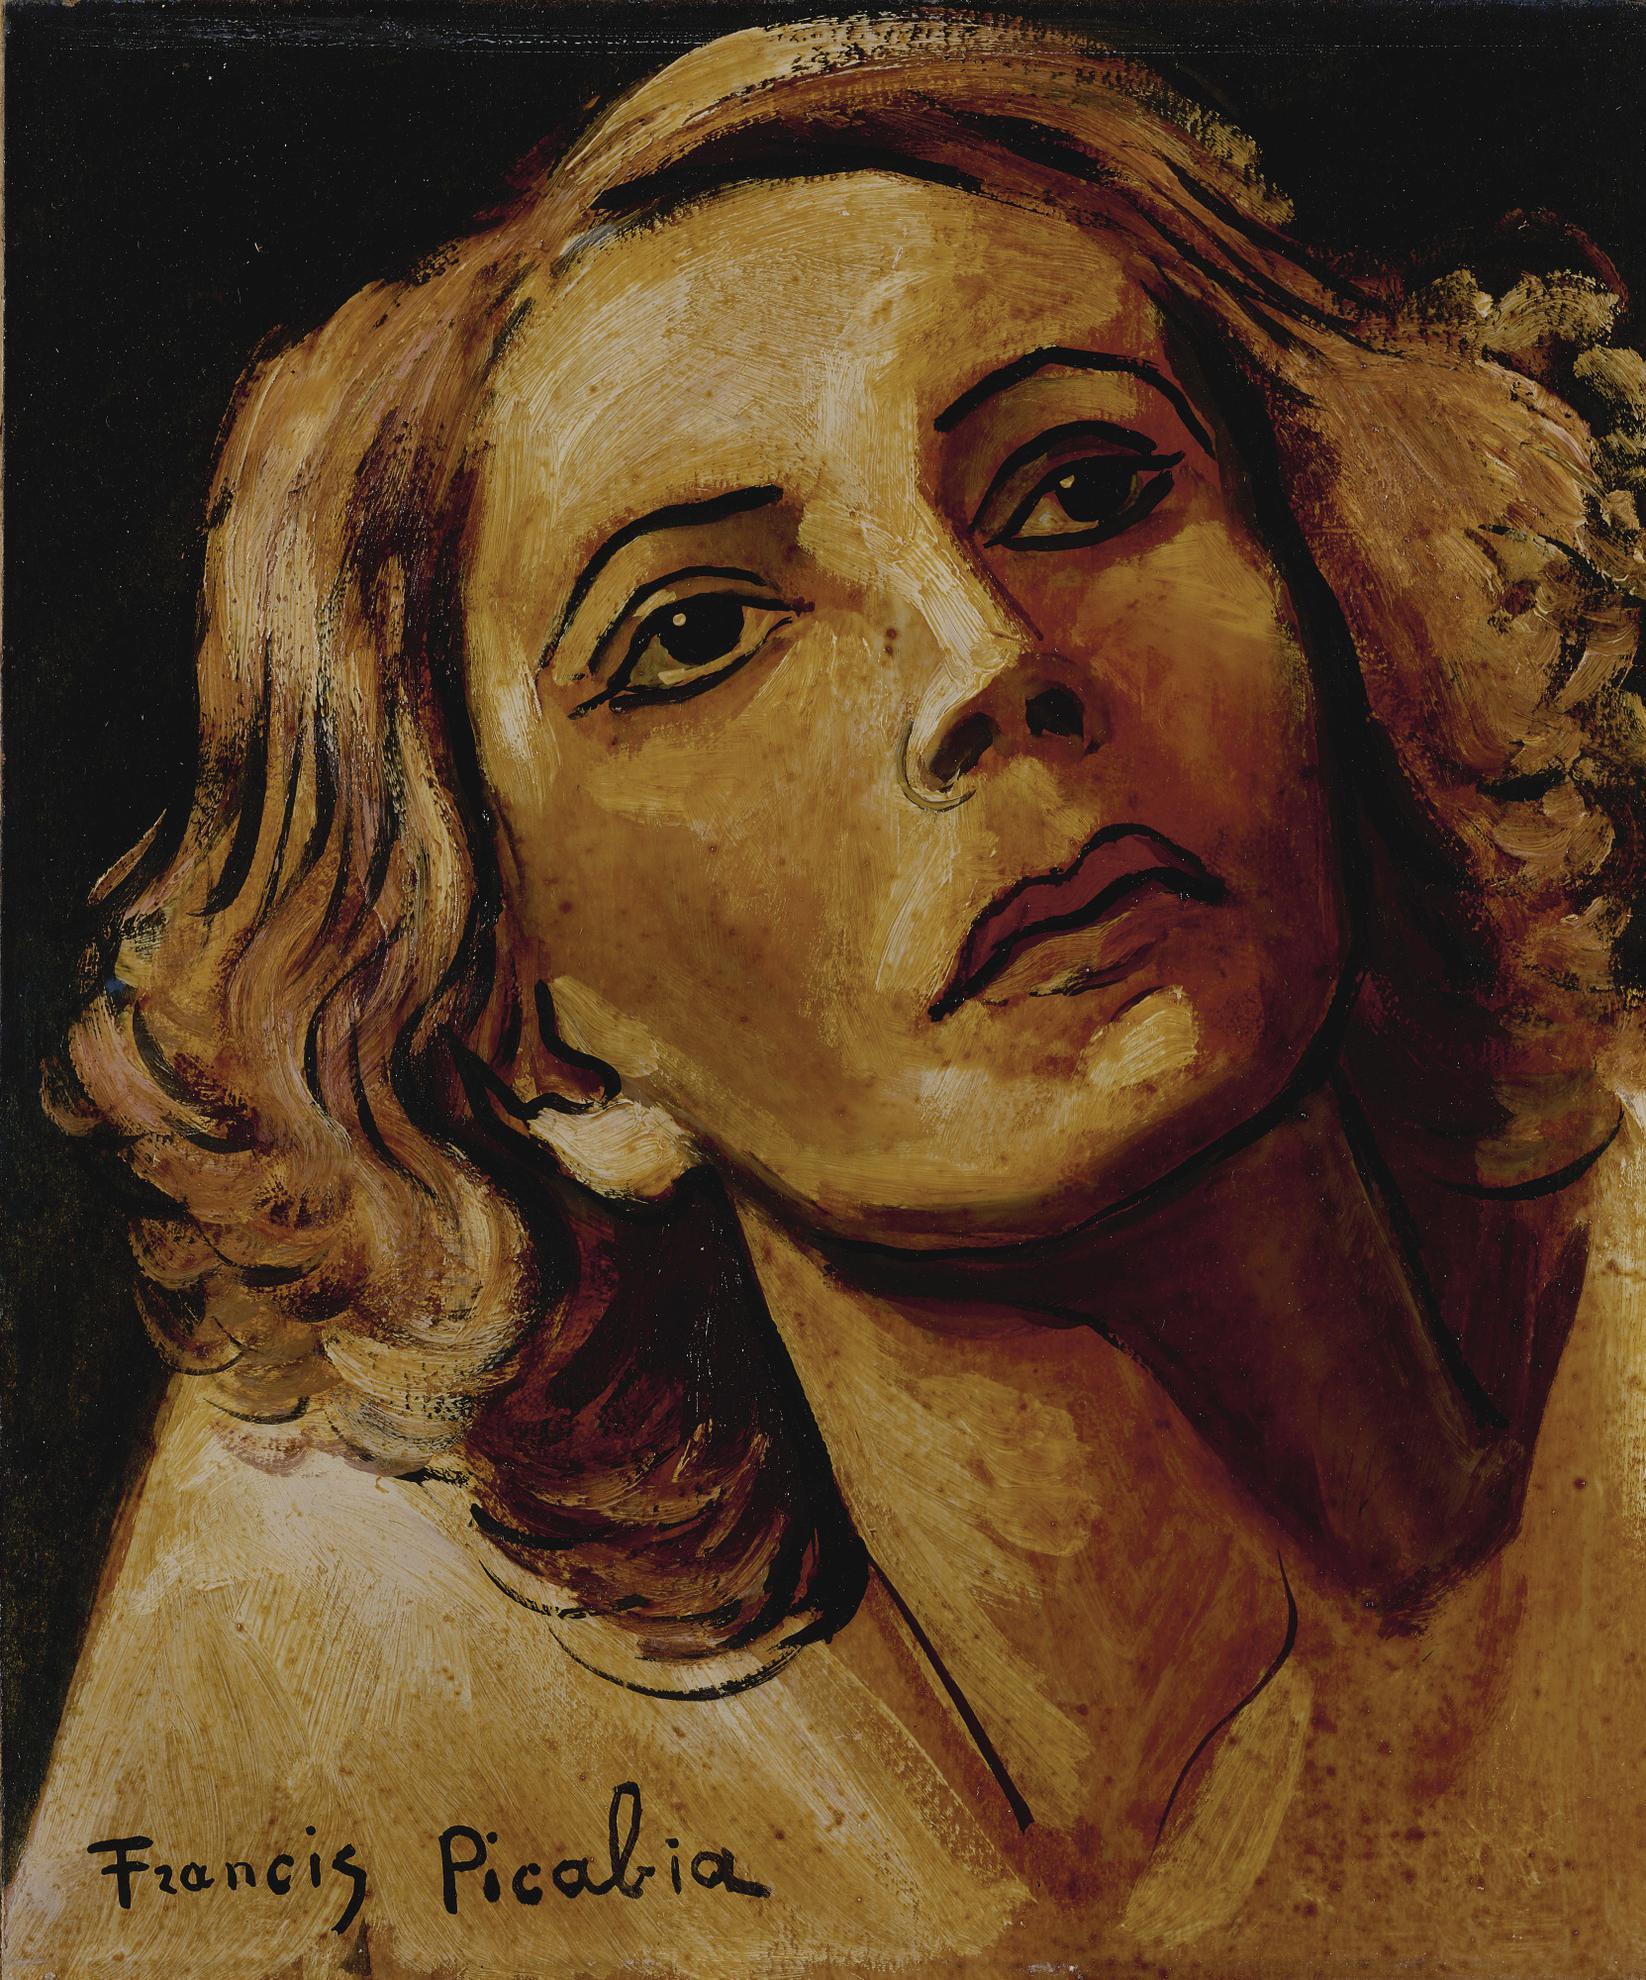 Francis Picabia-Femme Rousse-1943